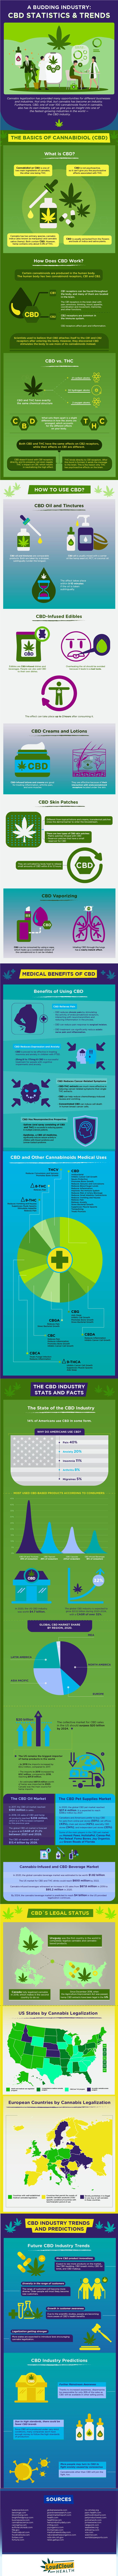 CBD Statistics Infographic 2021